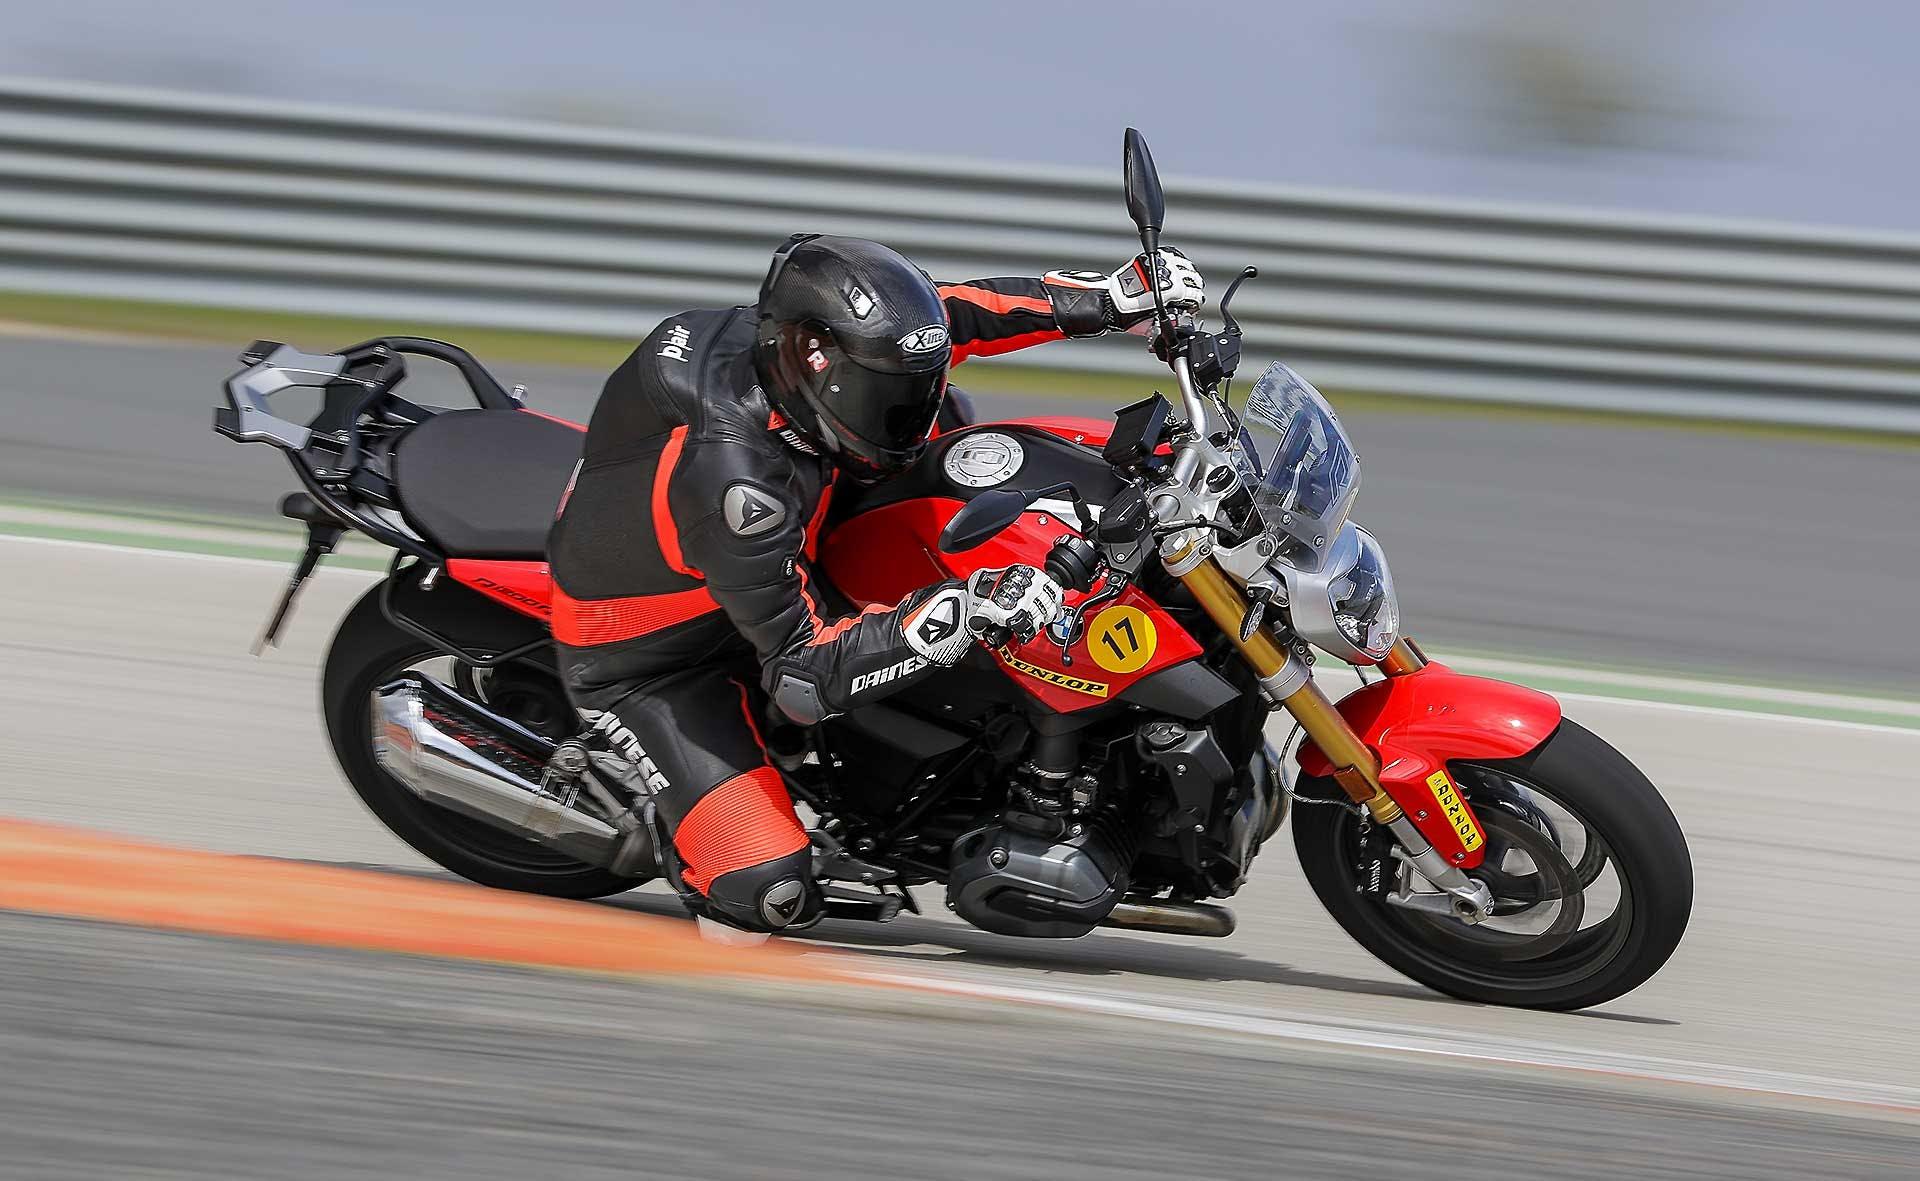 Dunlop SportSmart TT in pista con BMW R 1200 R